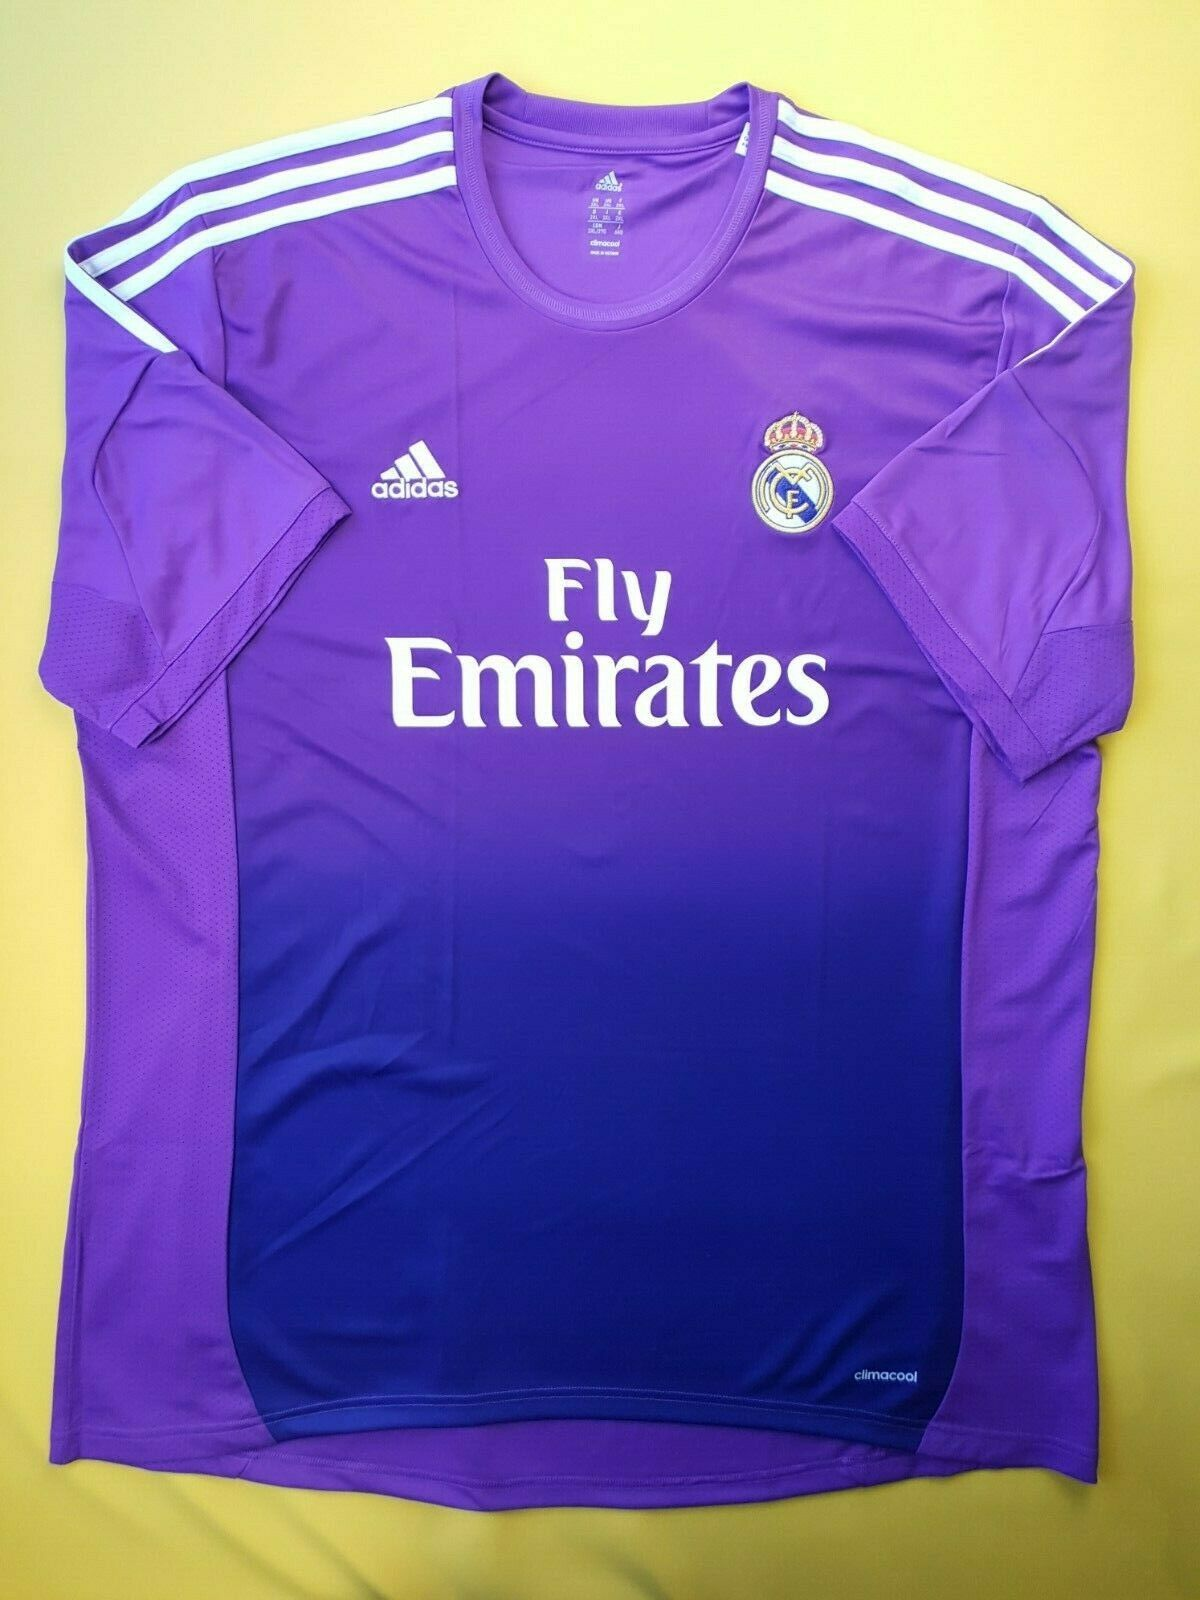 5 5 Real Madrid jersey 2XL 2013 2014 goalkeeper shirt G81065 soccer Adidas ig93